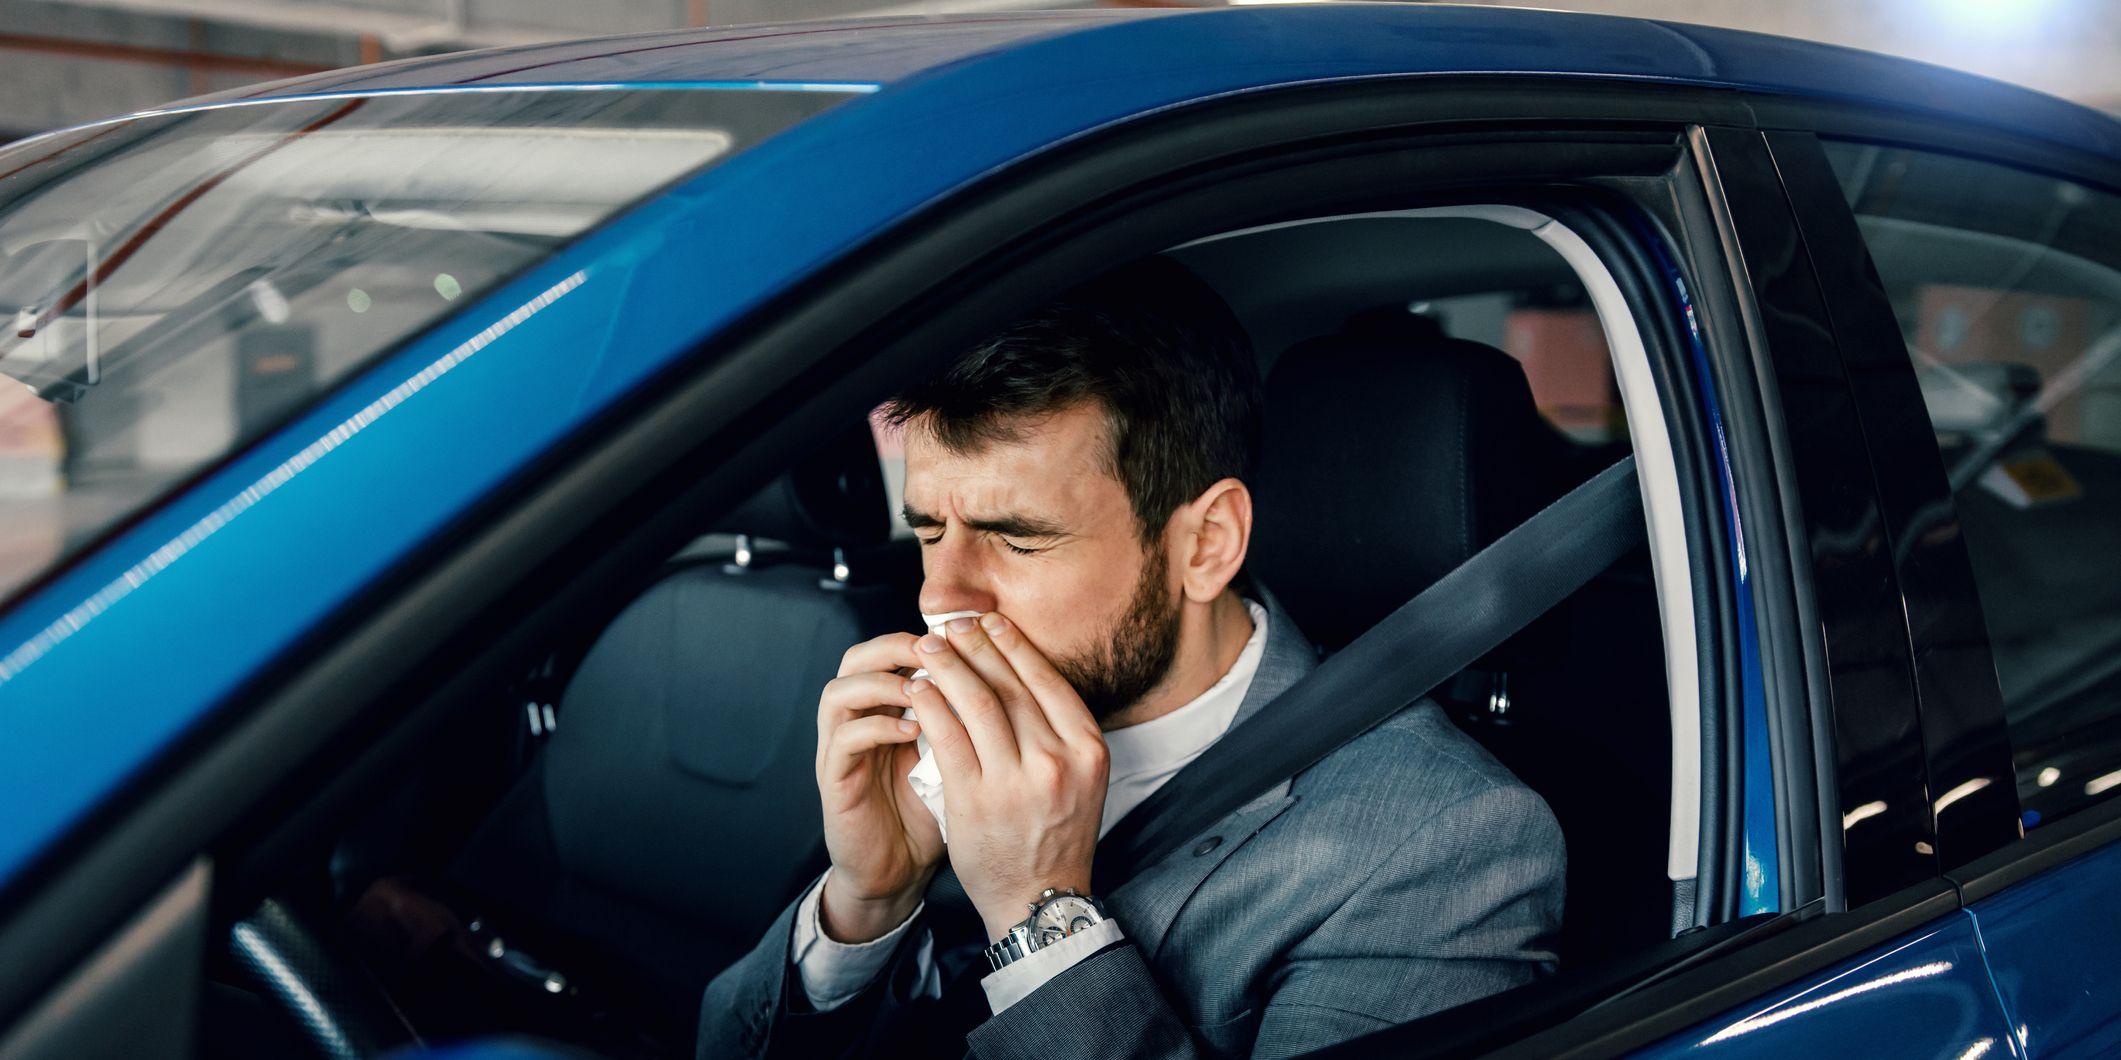 Uber, Lyft Drivers with Coronavirus Will Get Financial Help